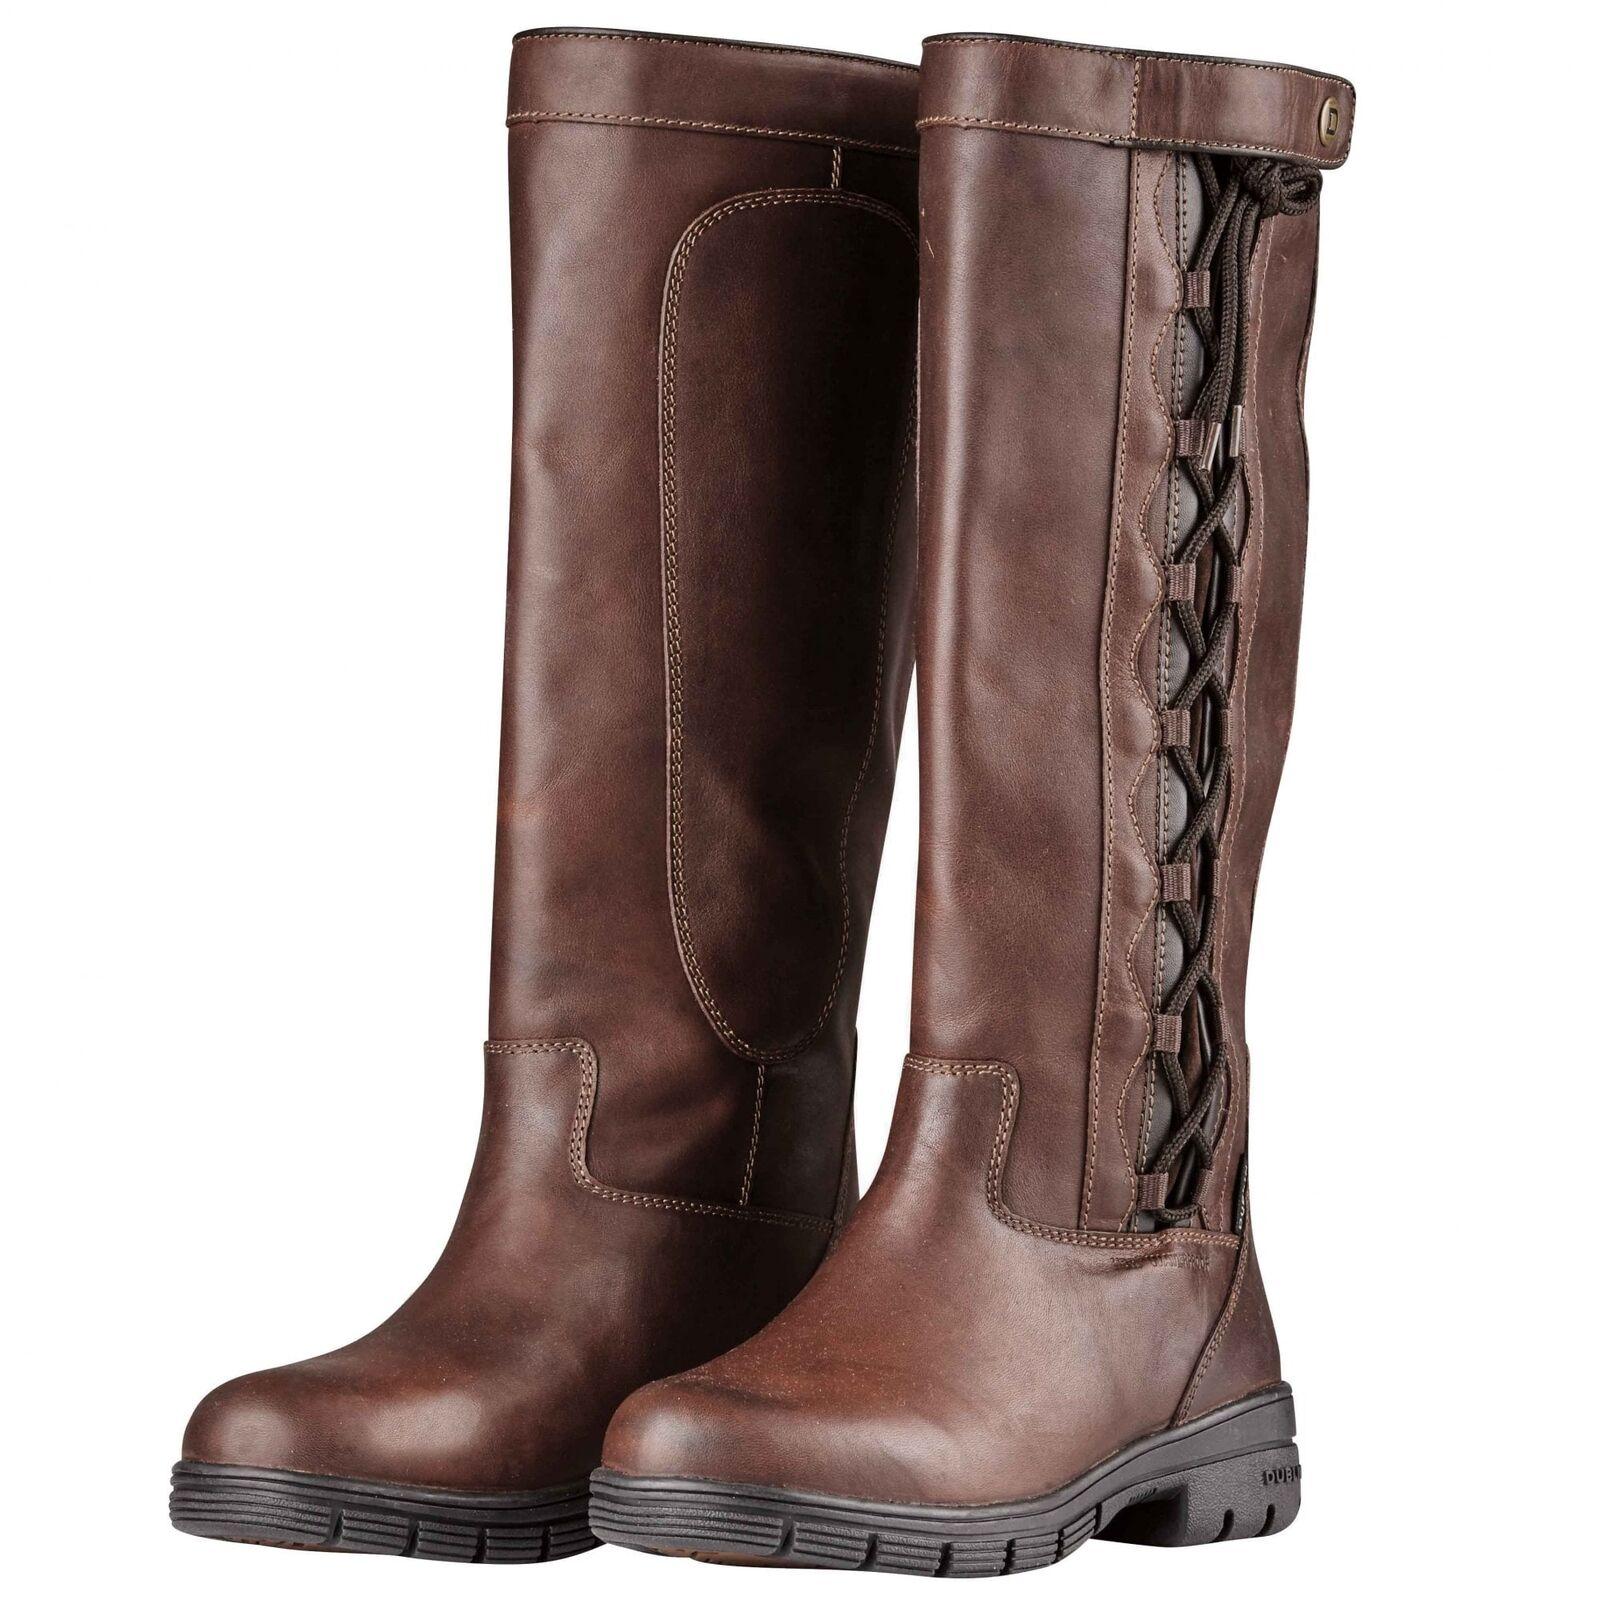 Dublin Pinnacle Grain Boots II Red Brown UK SHOE SIZES